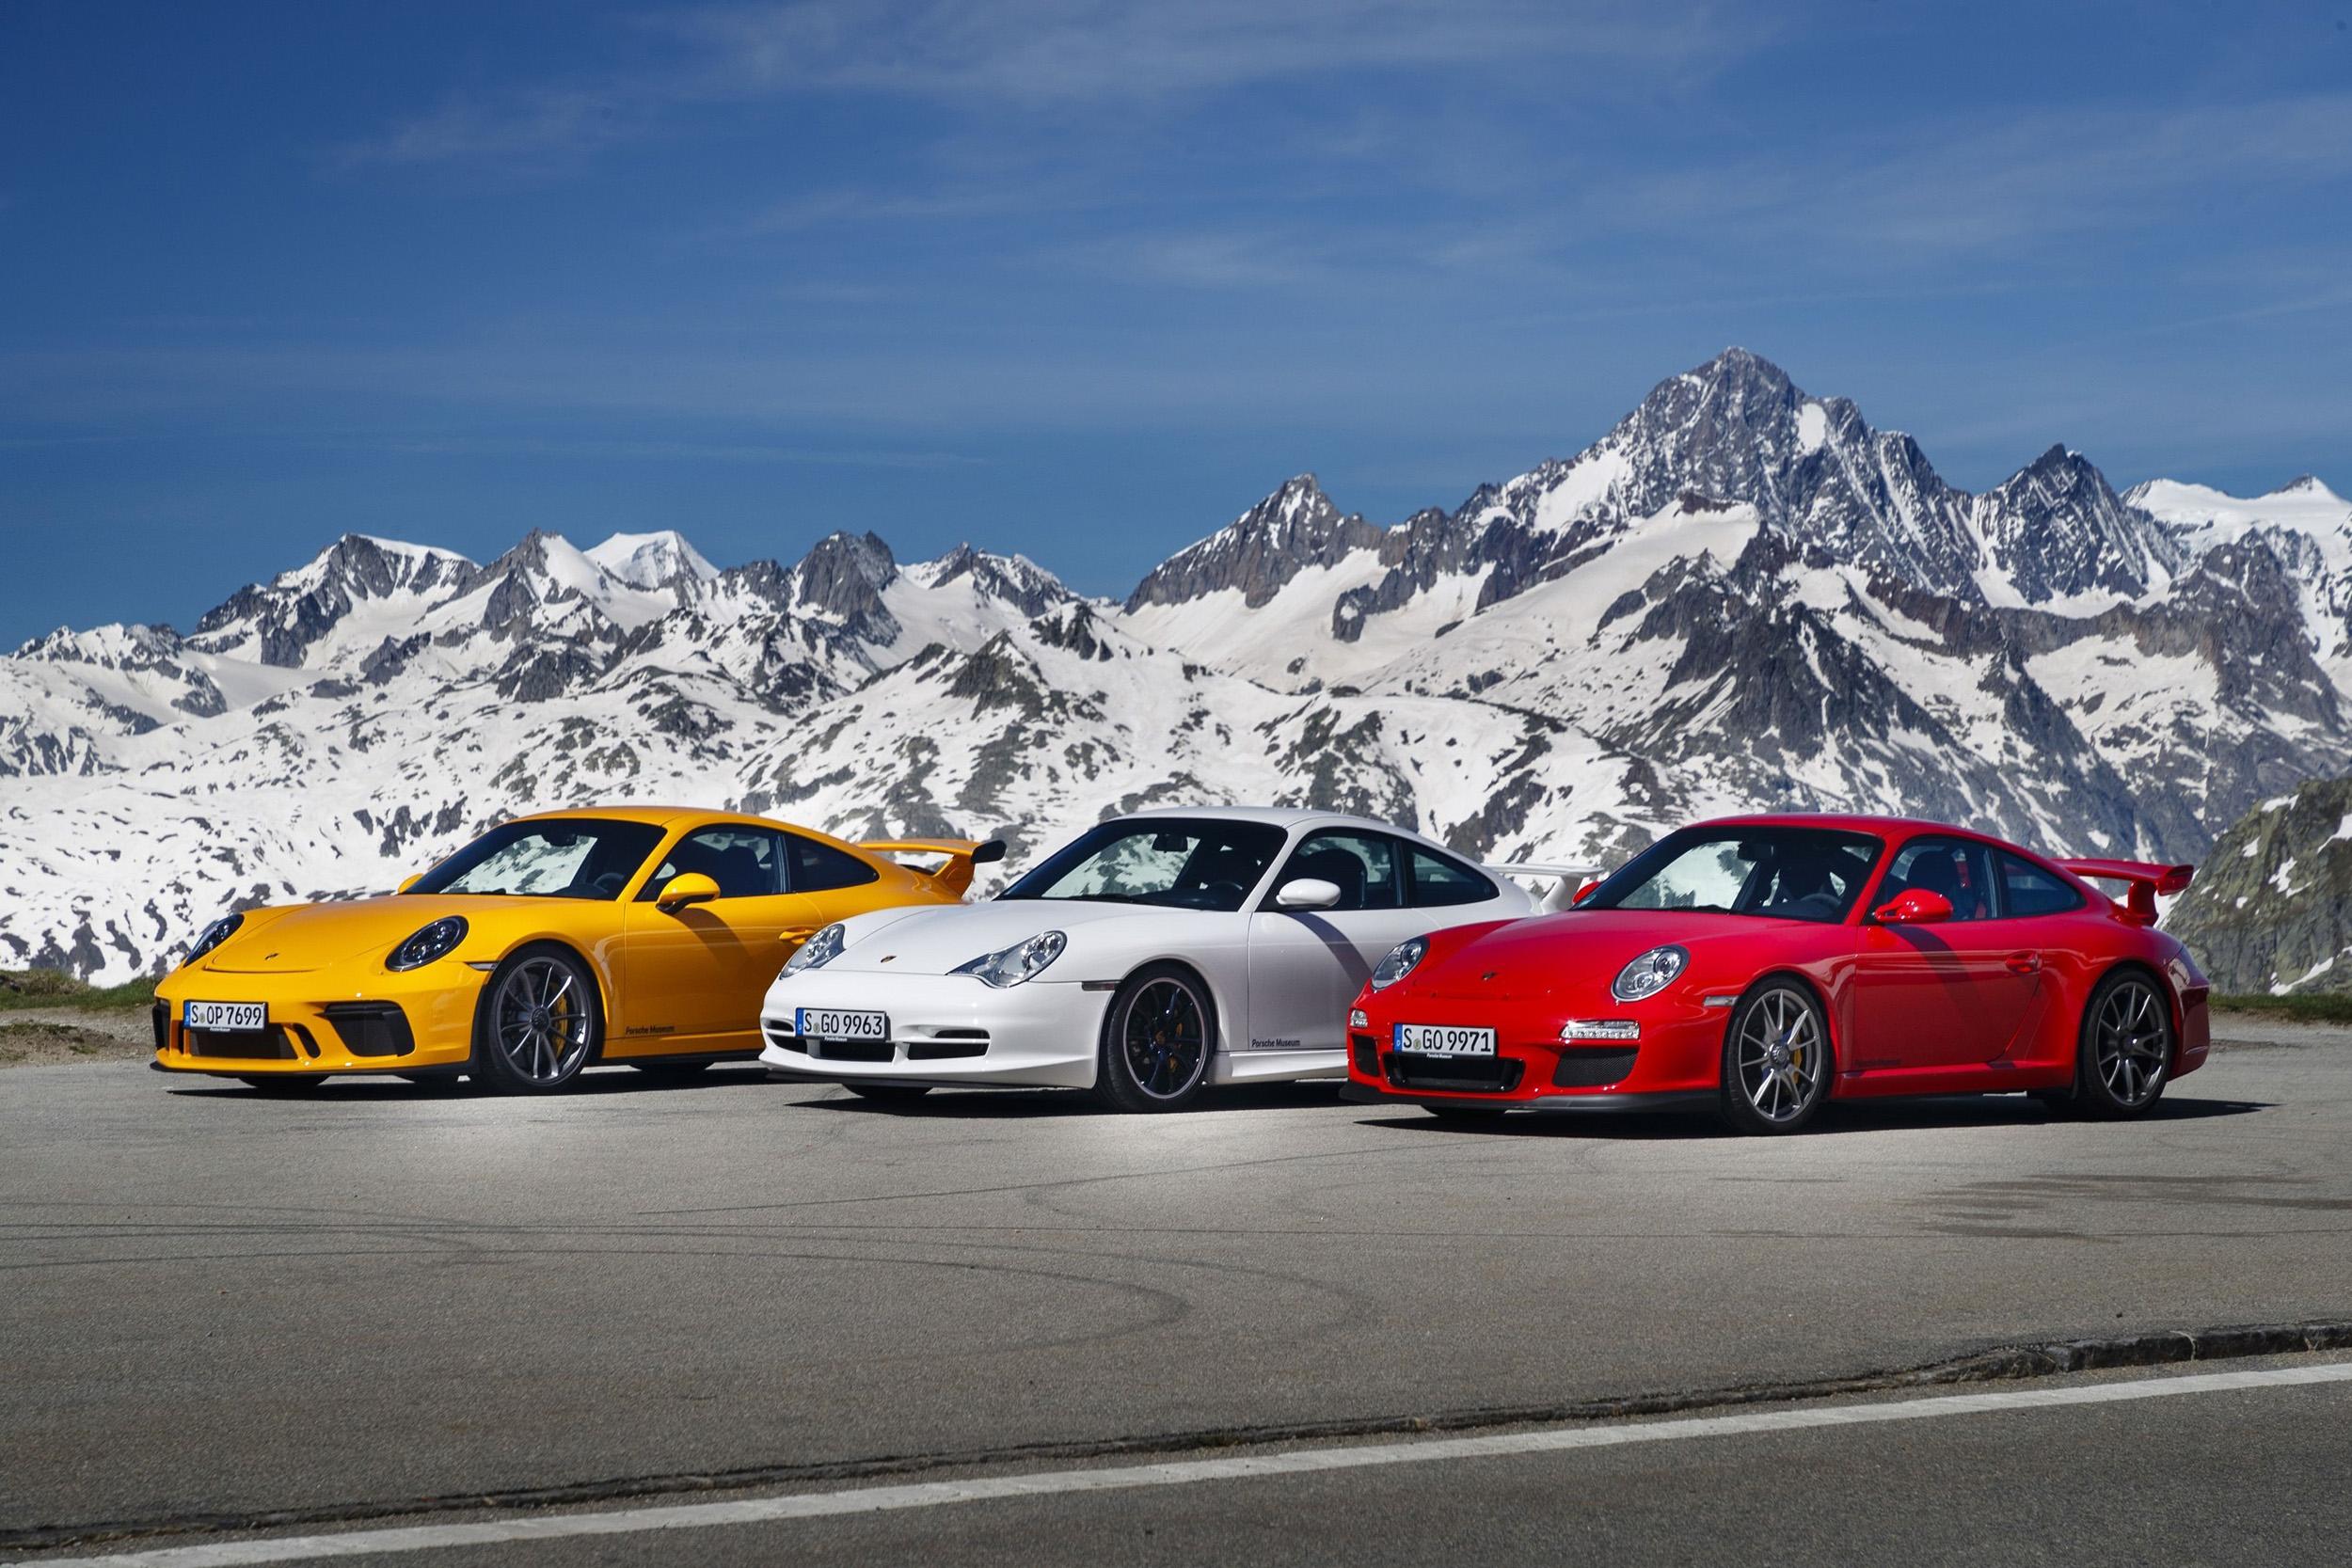 Porsche 911 GTS generations